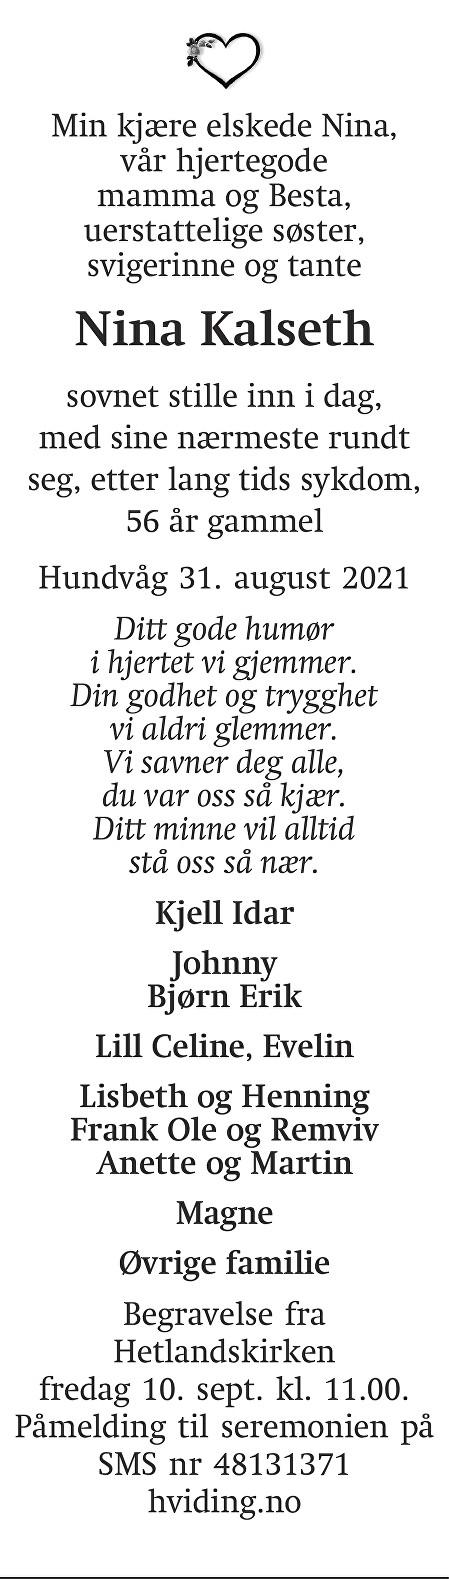 Nina Kalseth Dødsannonse